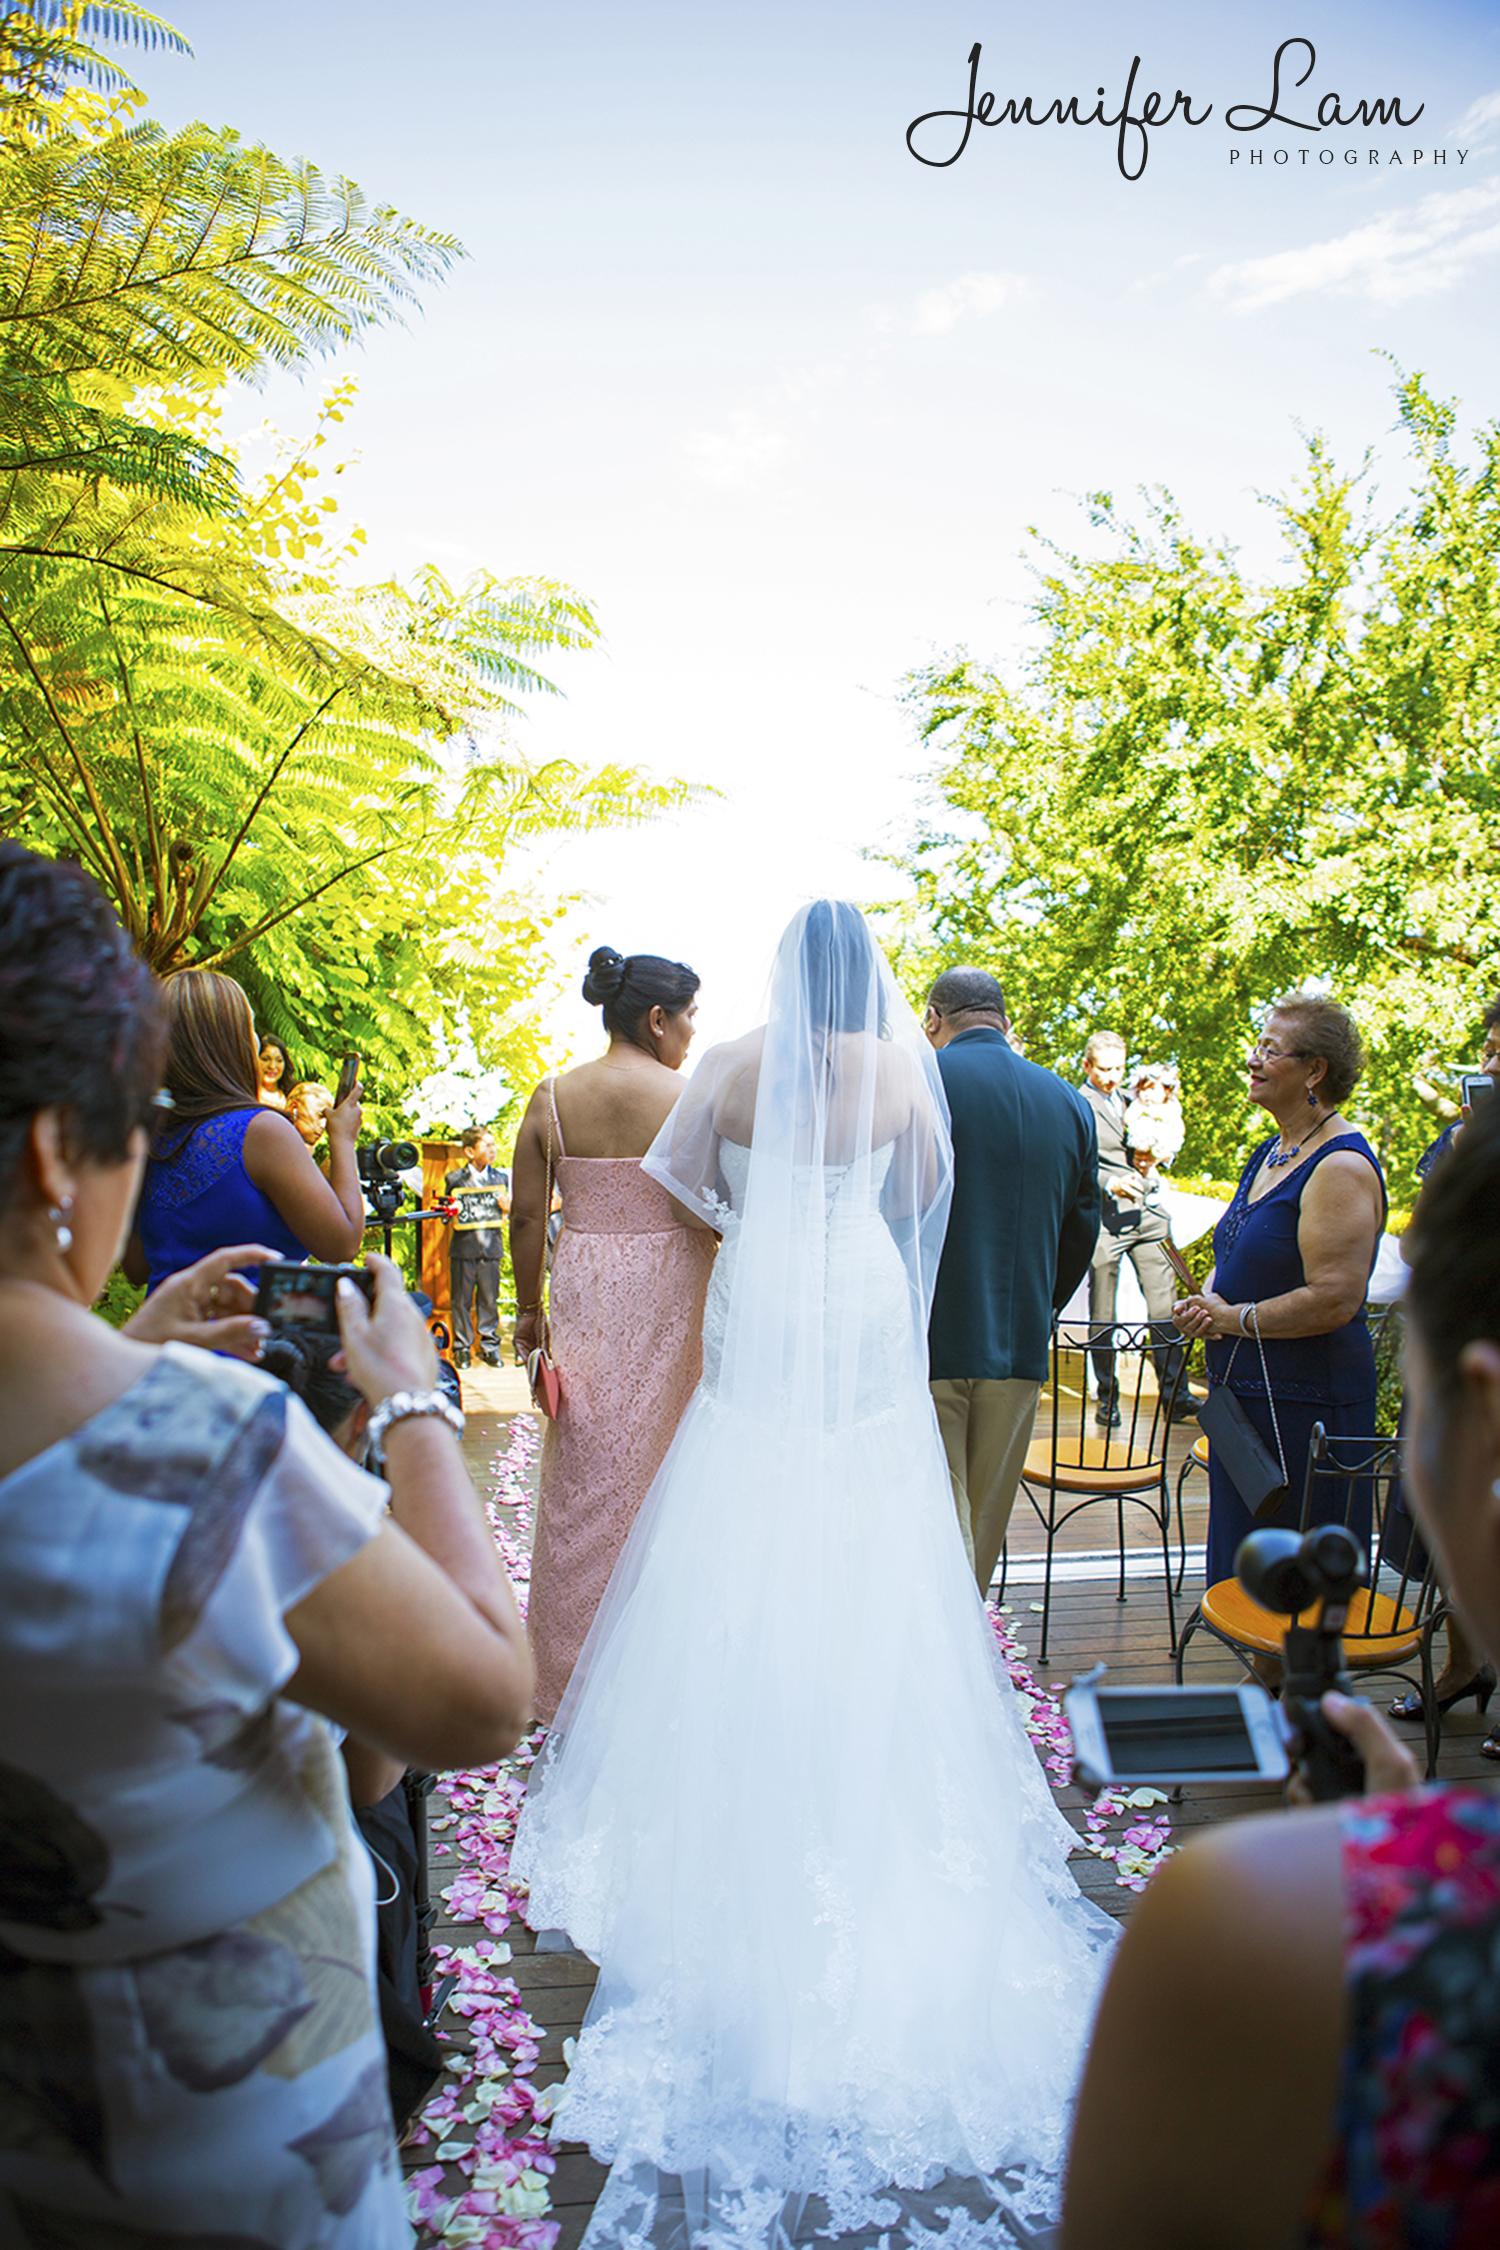 Sydney Wedding Photographer - Jennifer Lam Photography - www.jenniferlamphotography (25).jpg